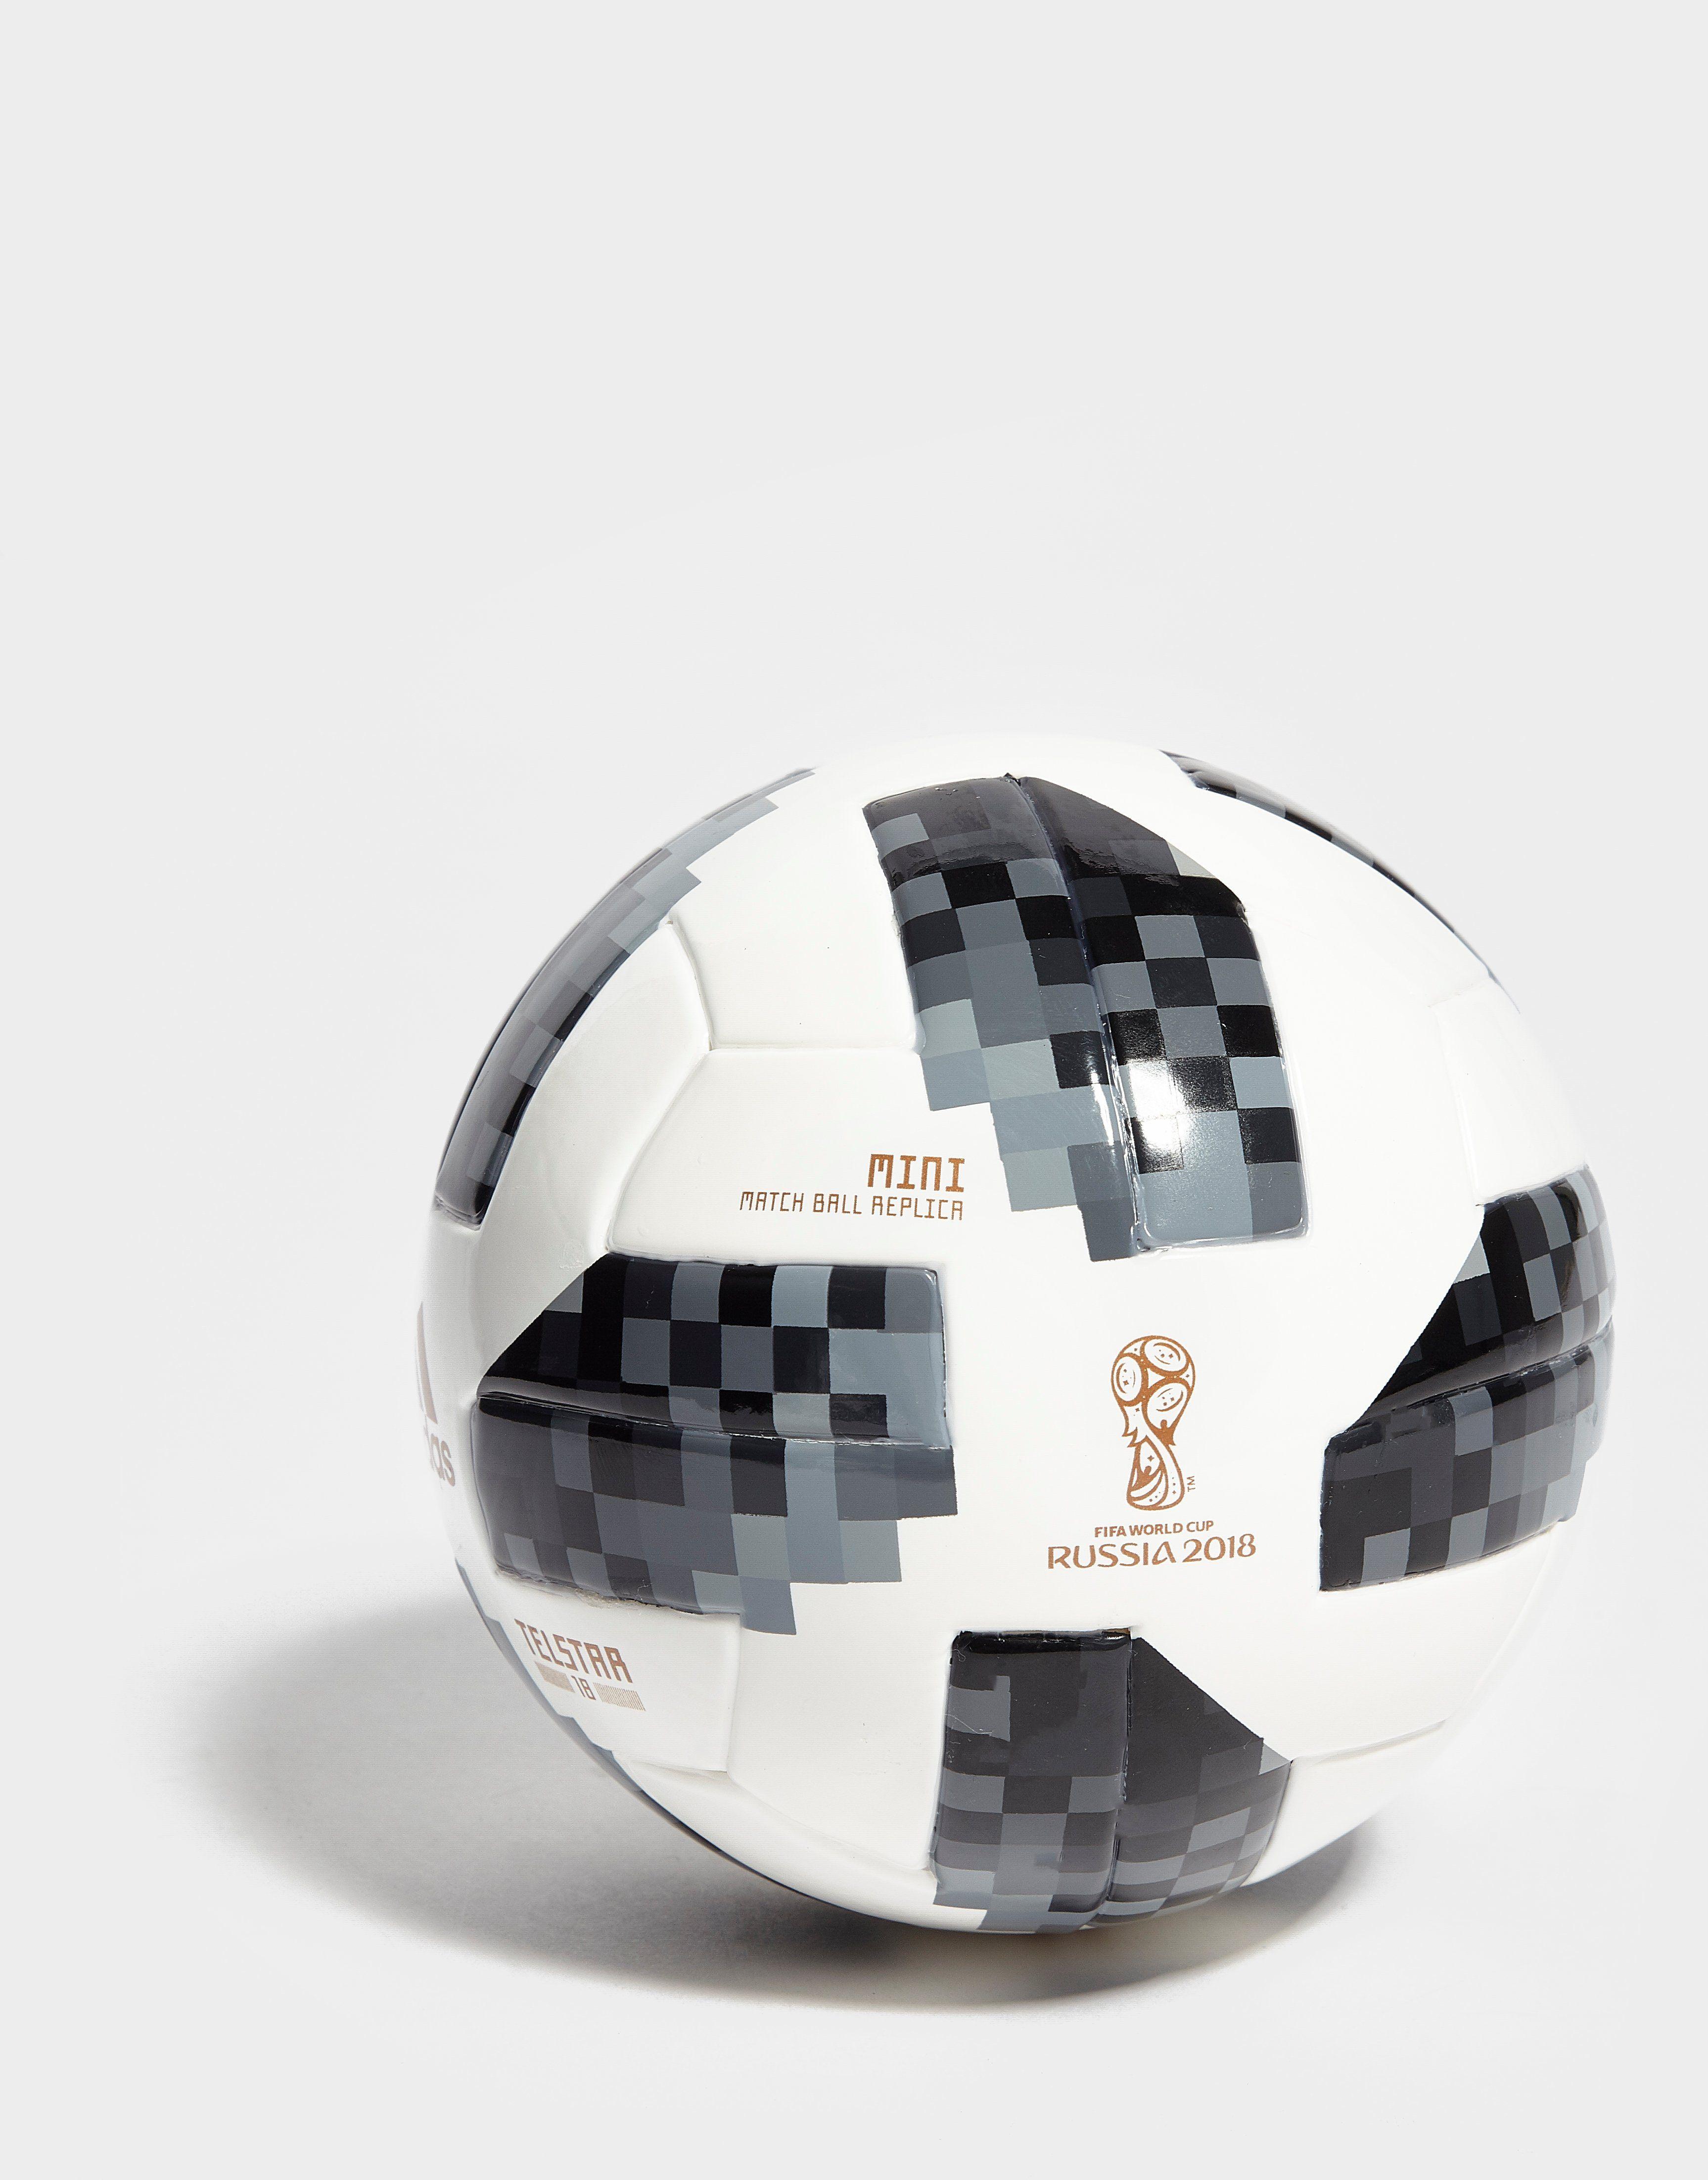 Adidas World Cup 2018 Mini Football by Adidas